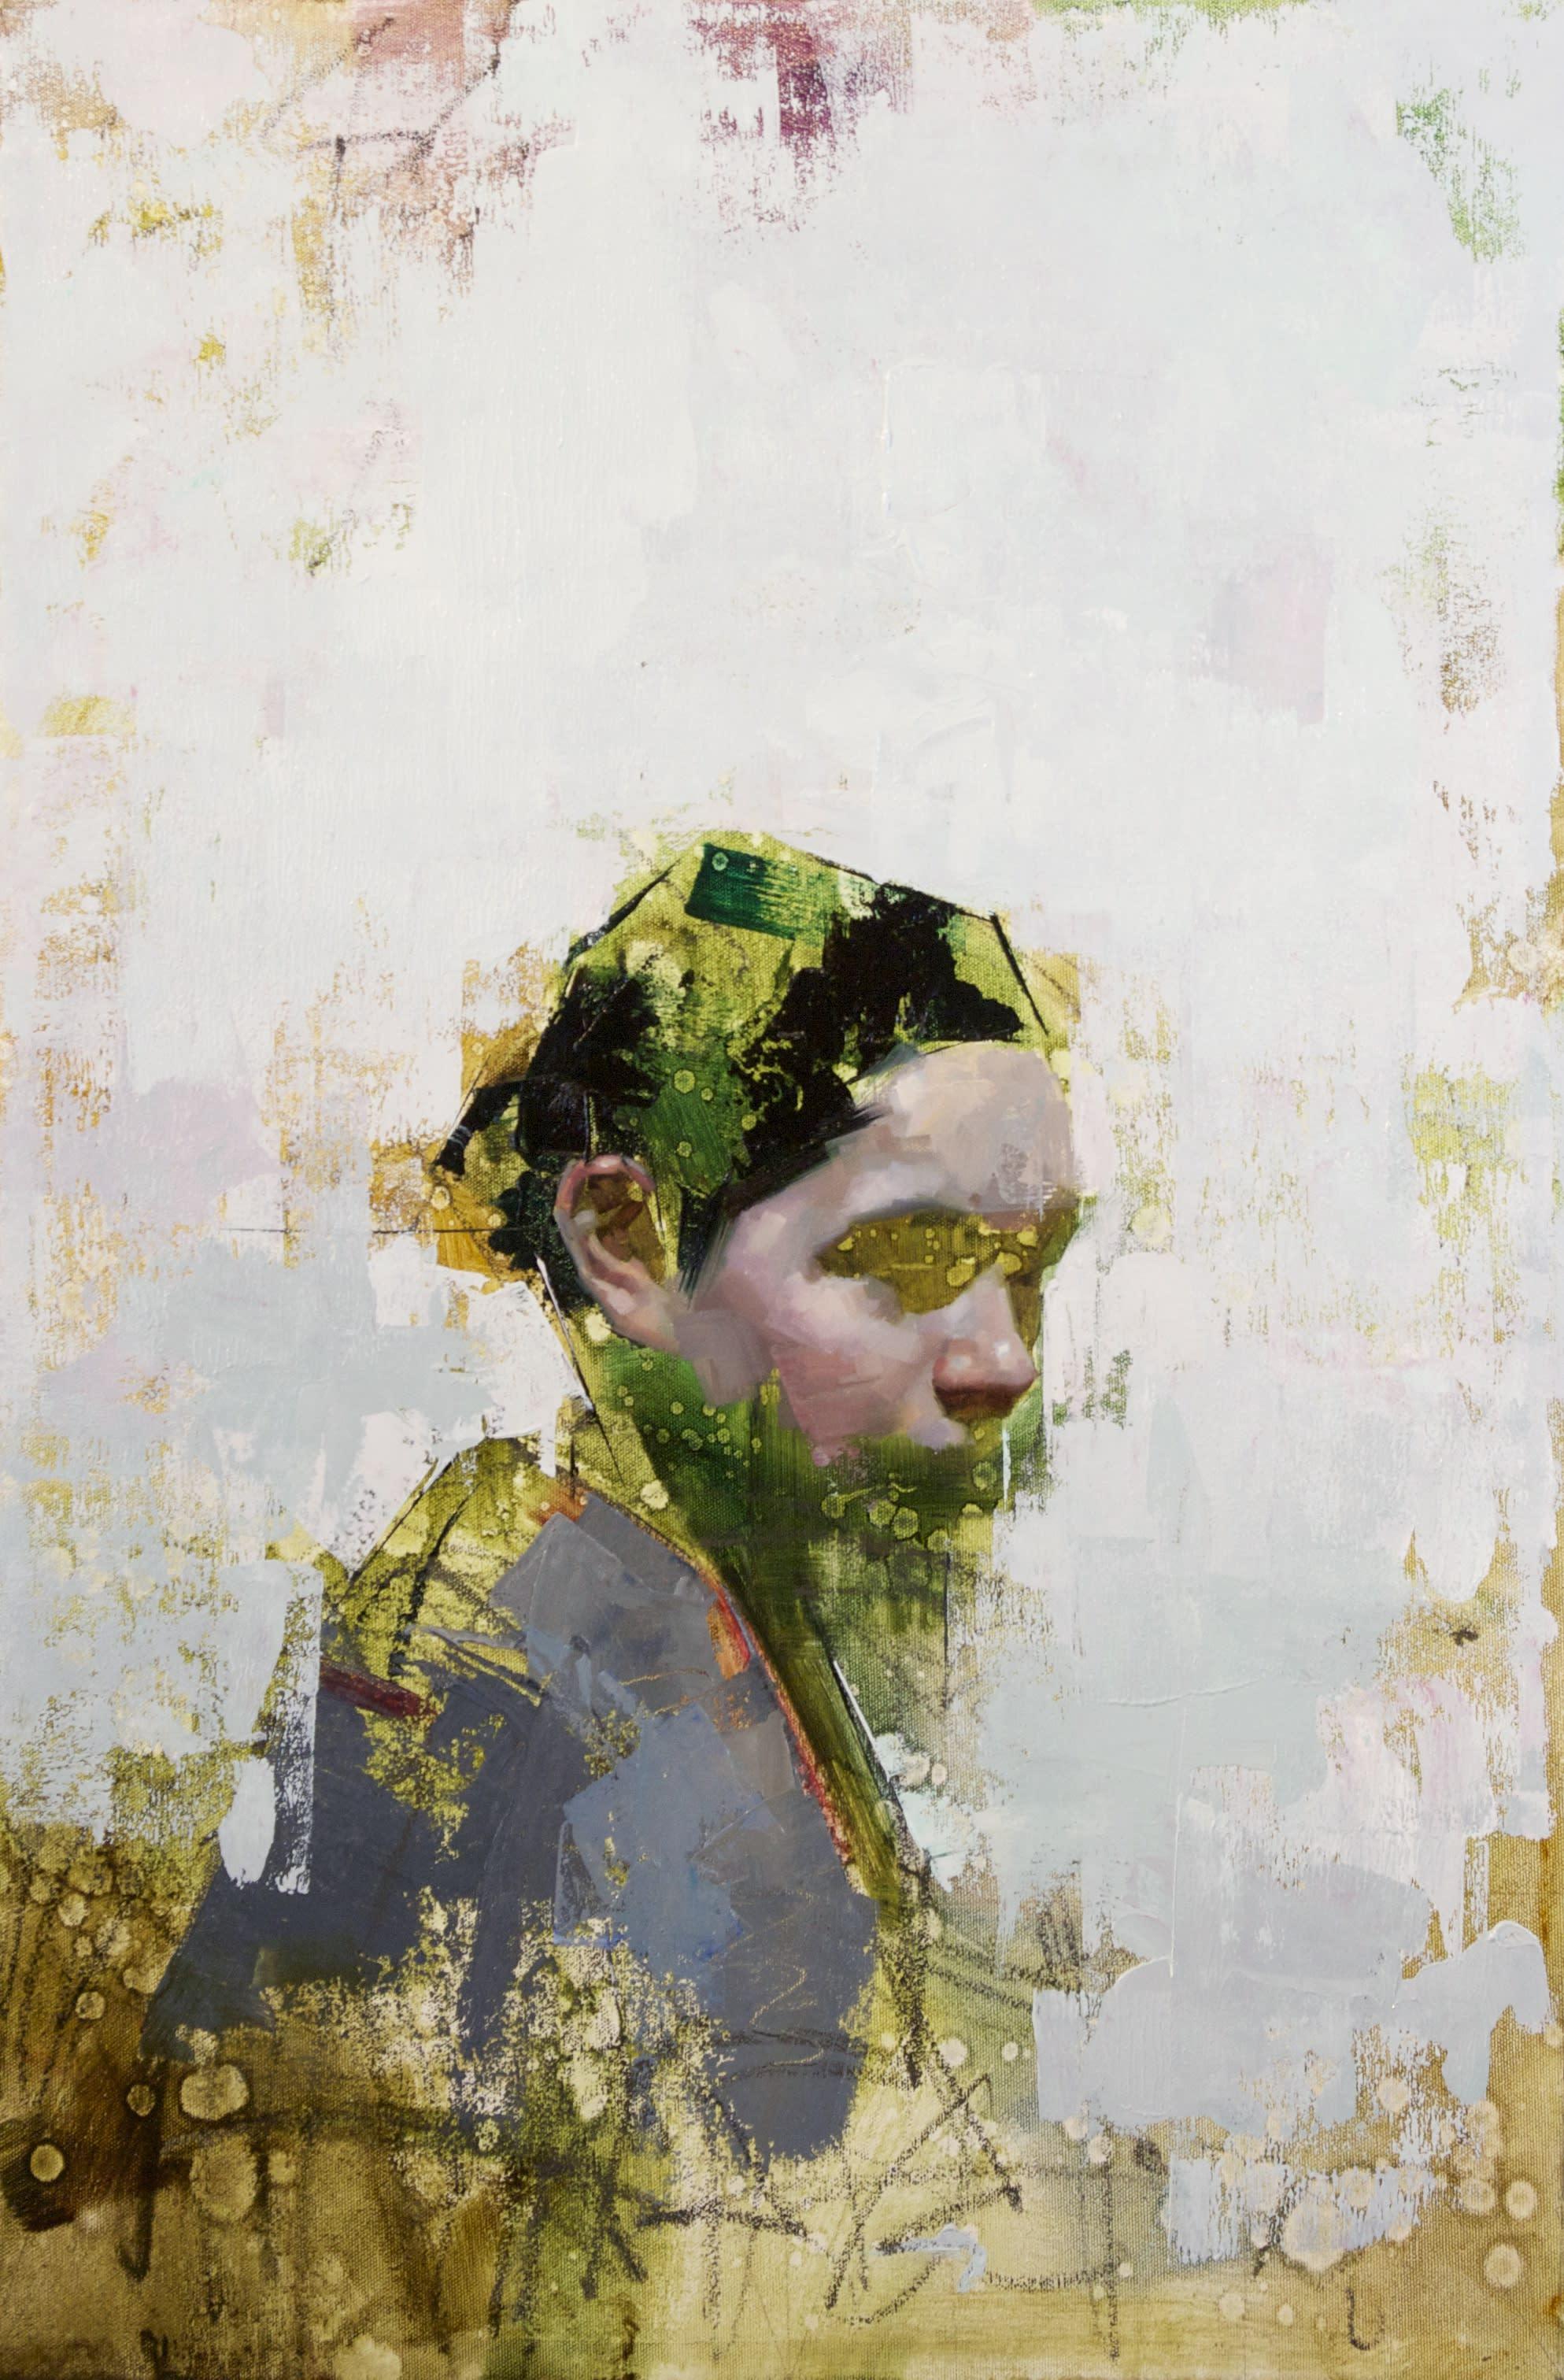 John Wentz painting